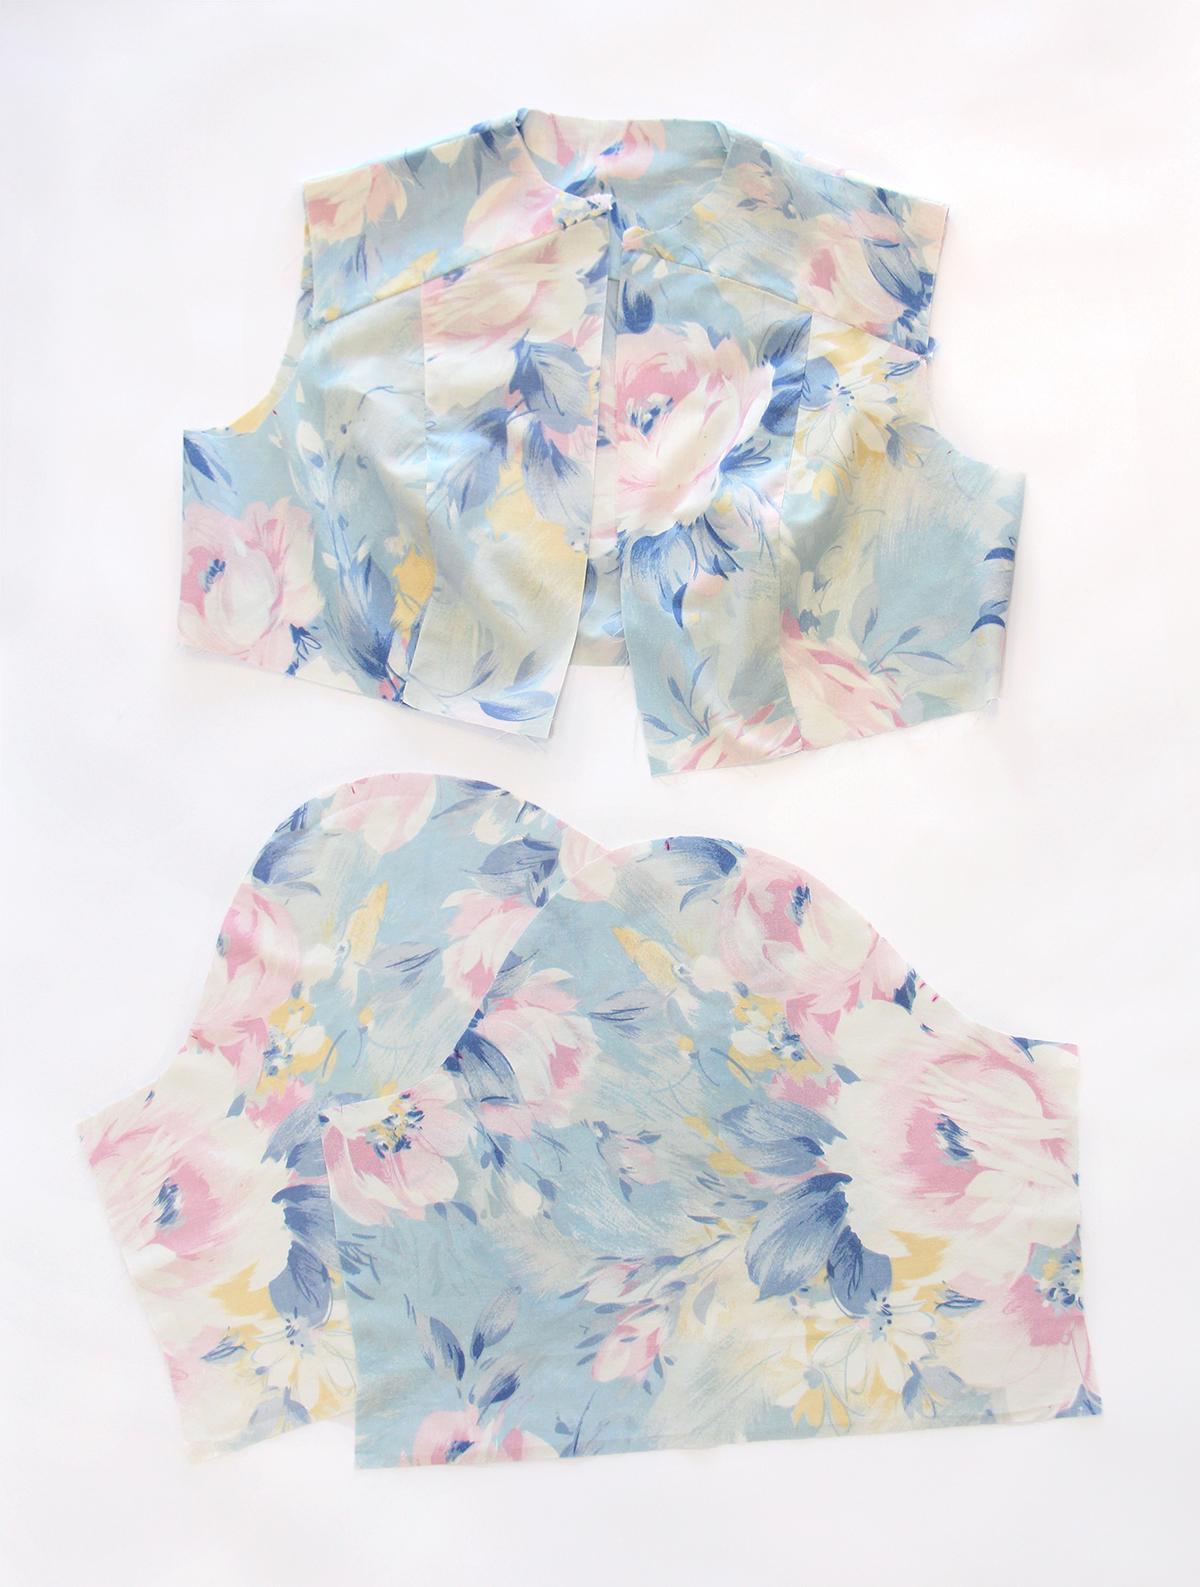 Megan Nielsen Patterns | Matilda Sewalong: Sleeves - Ready To Start Sewing Your Sleeves